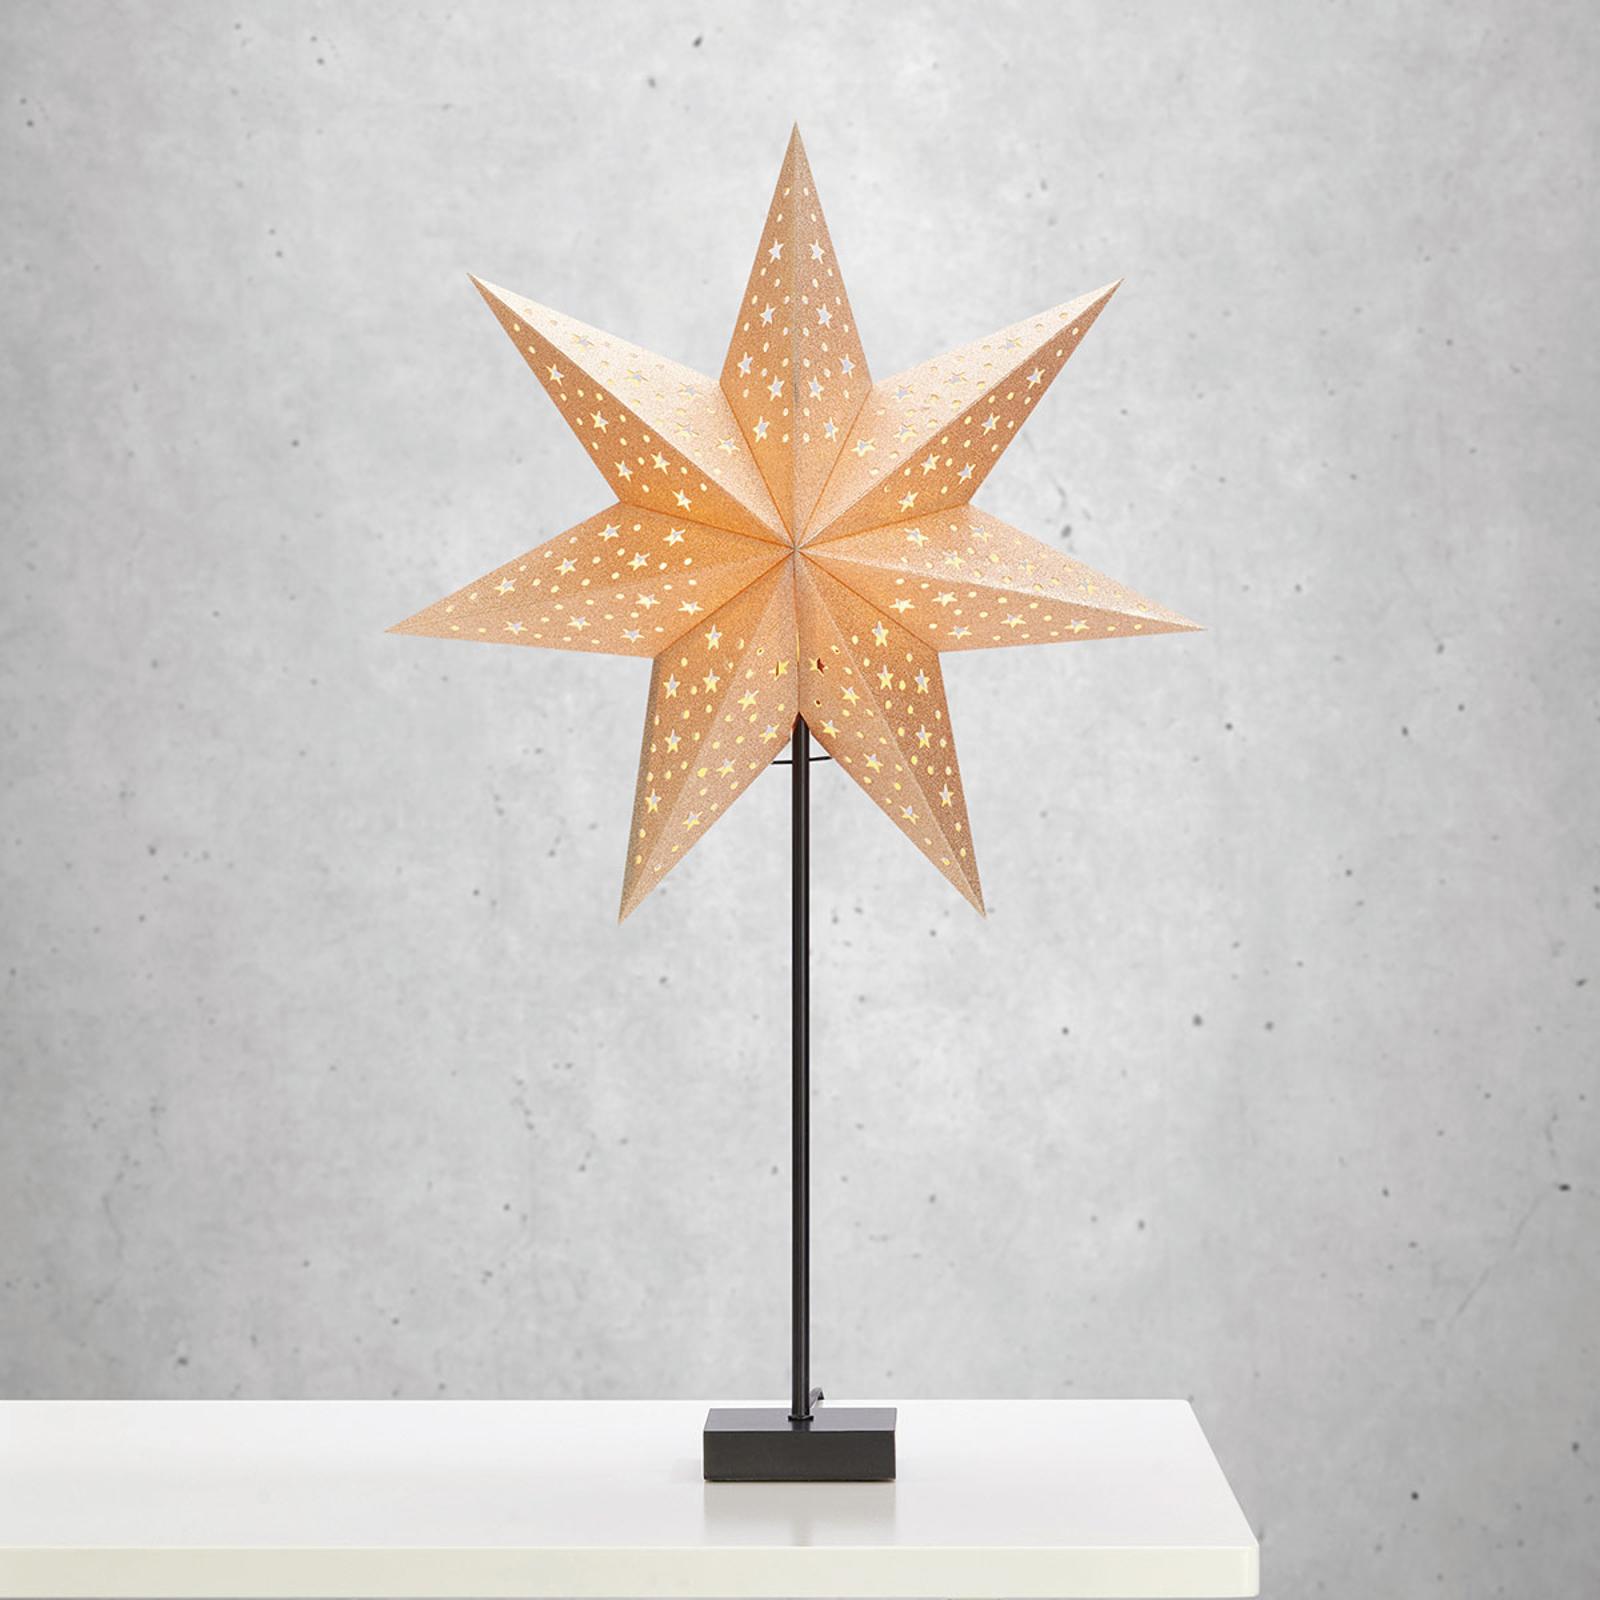 Stående stjerne Solvalla - højde 69 cm